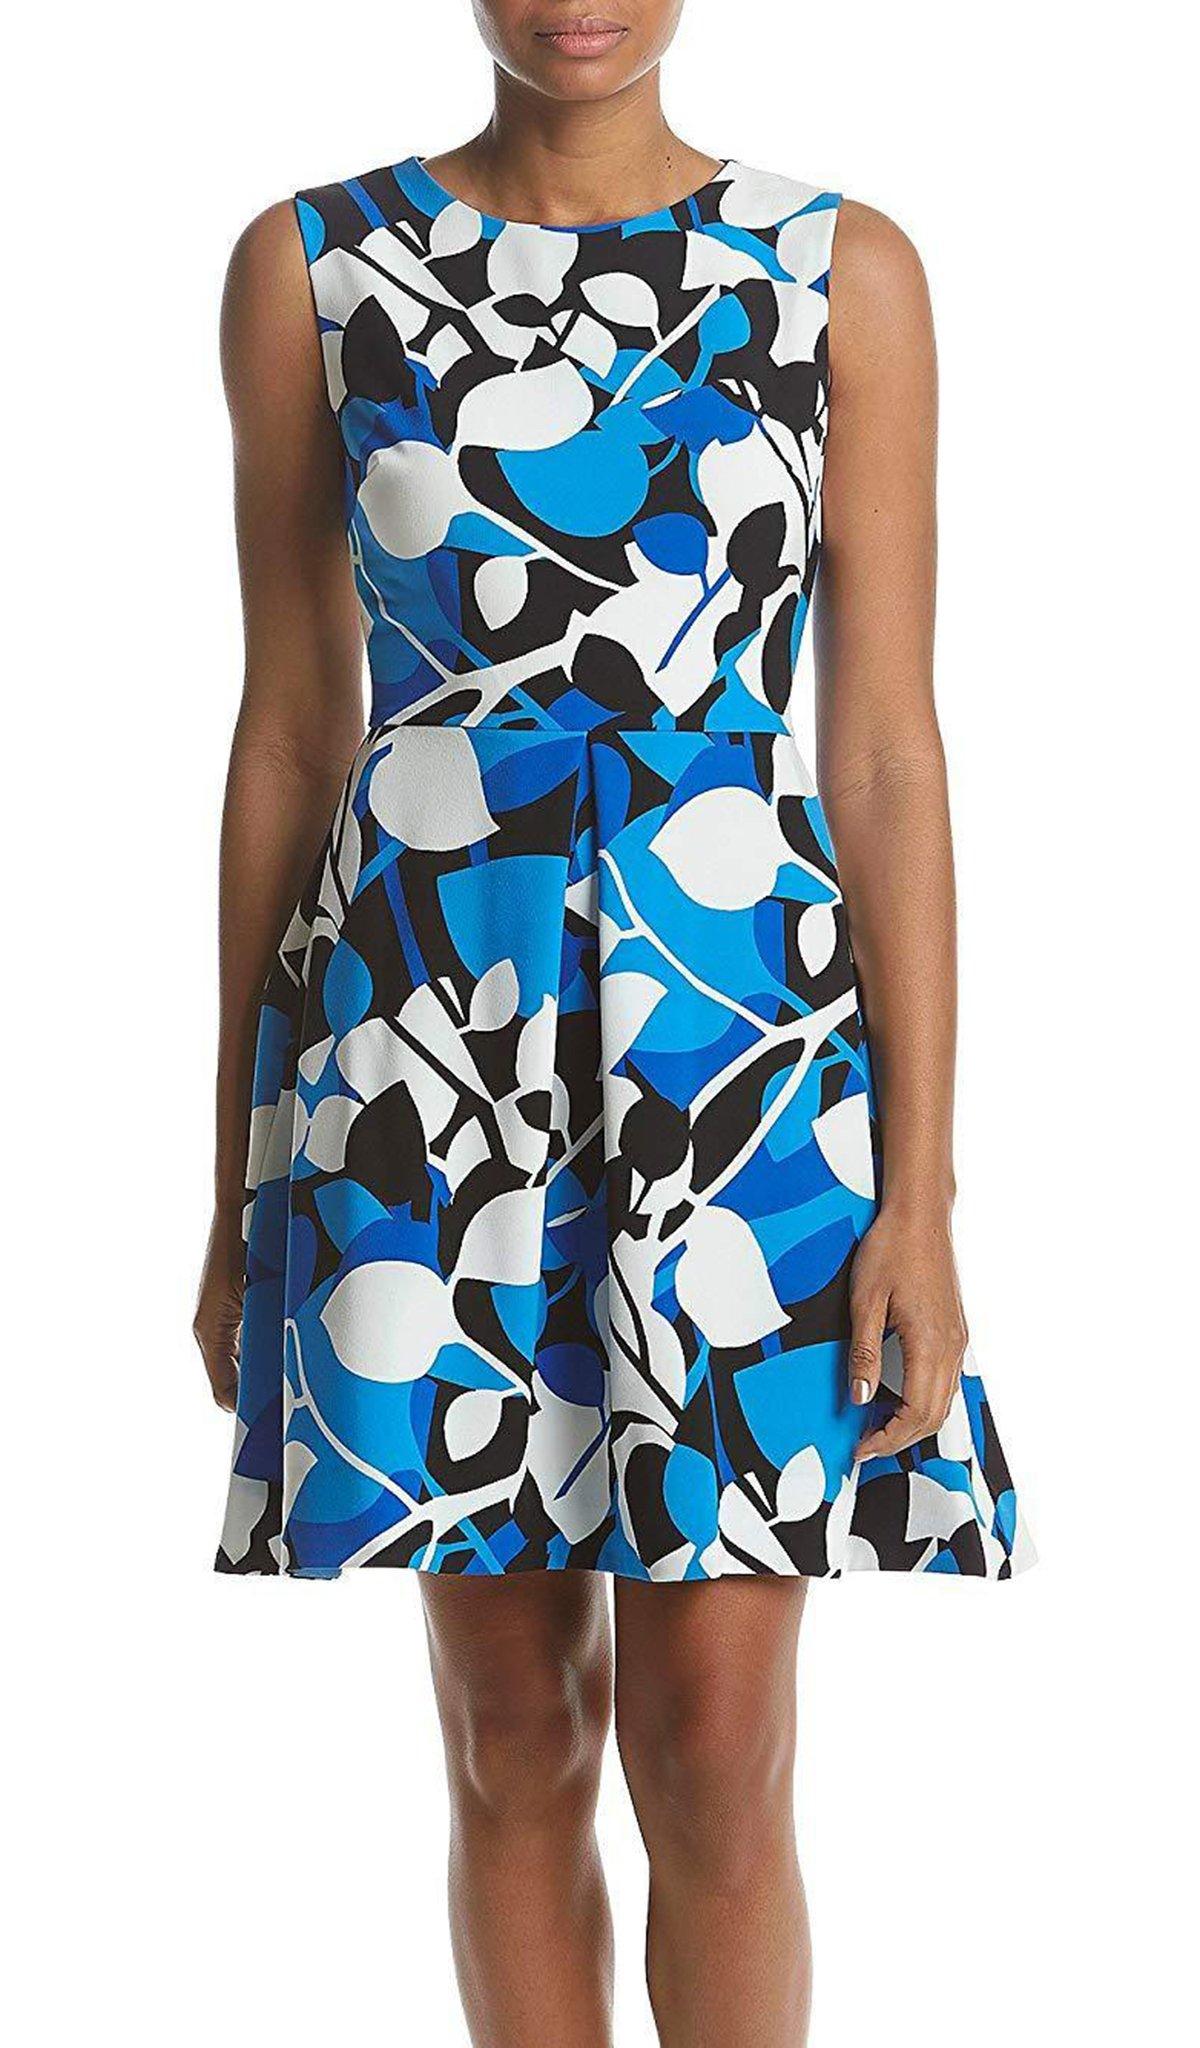 Taylor - 9612MJ Printed Jewel Neck Pleated A-line Dress